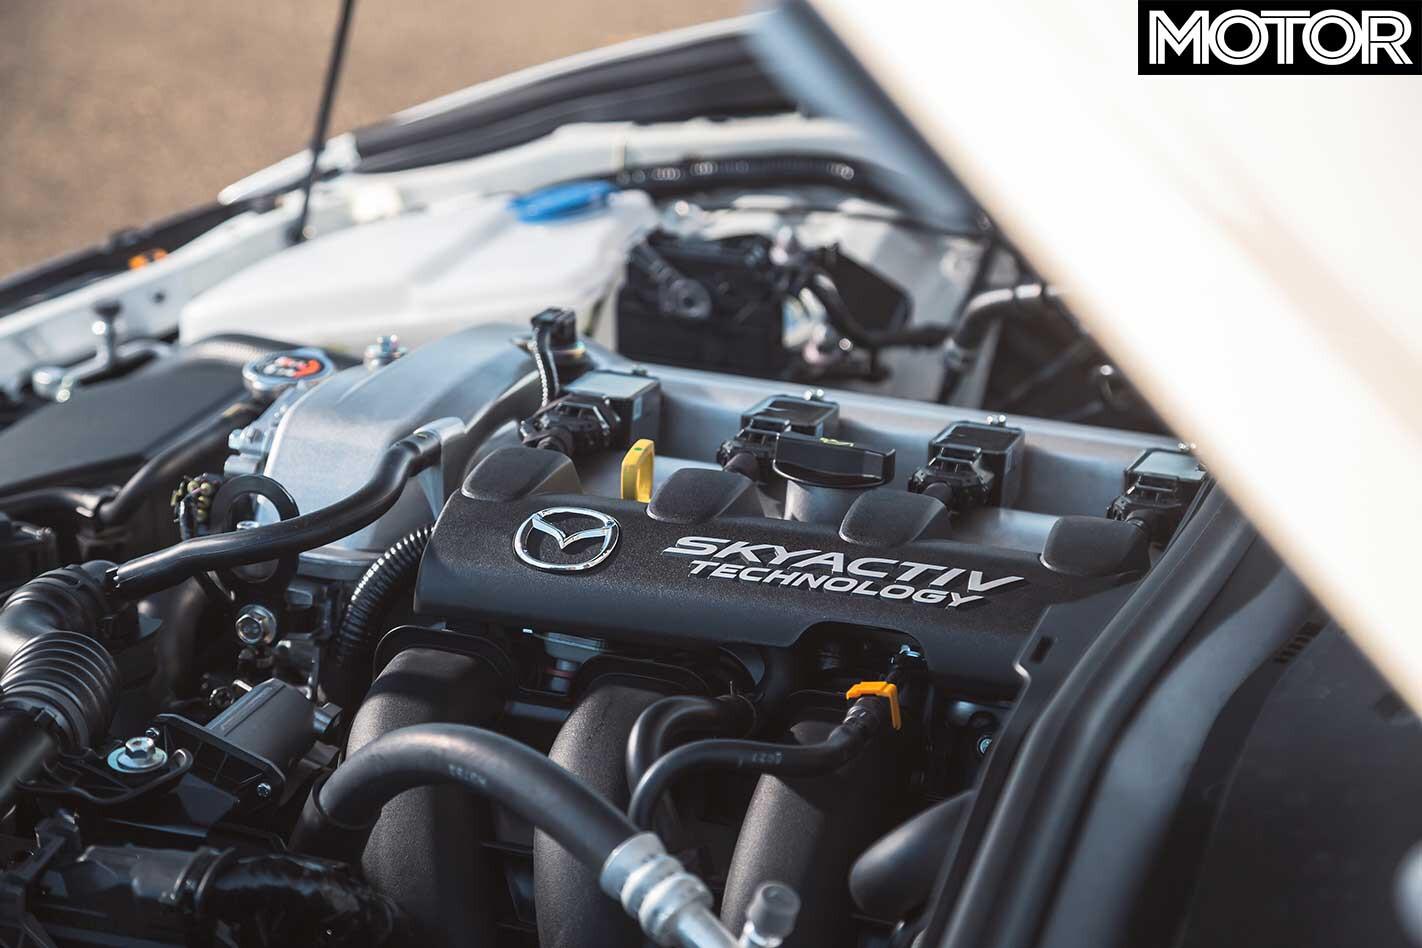 2018 Mazda MX 5 RF Engine Jpg